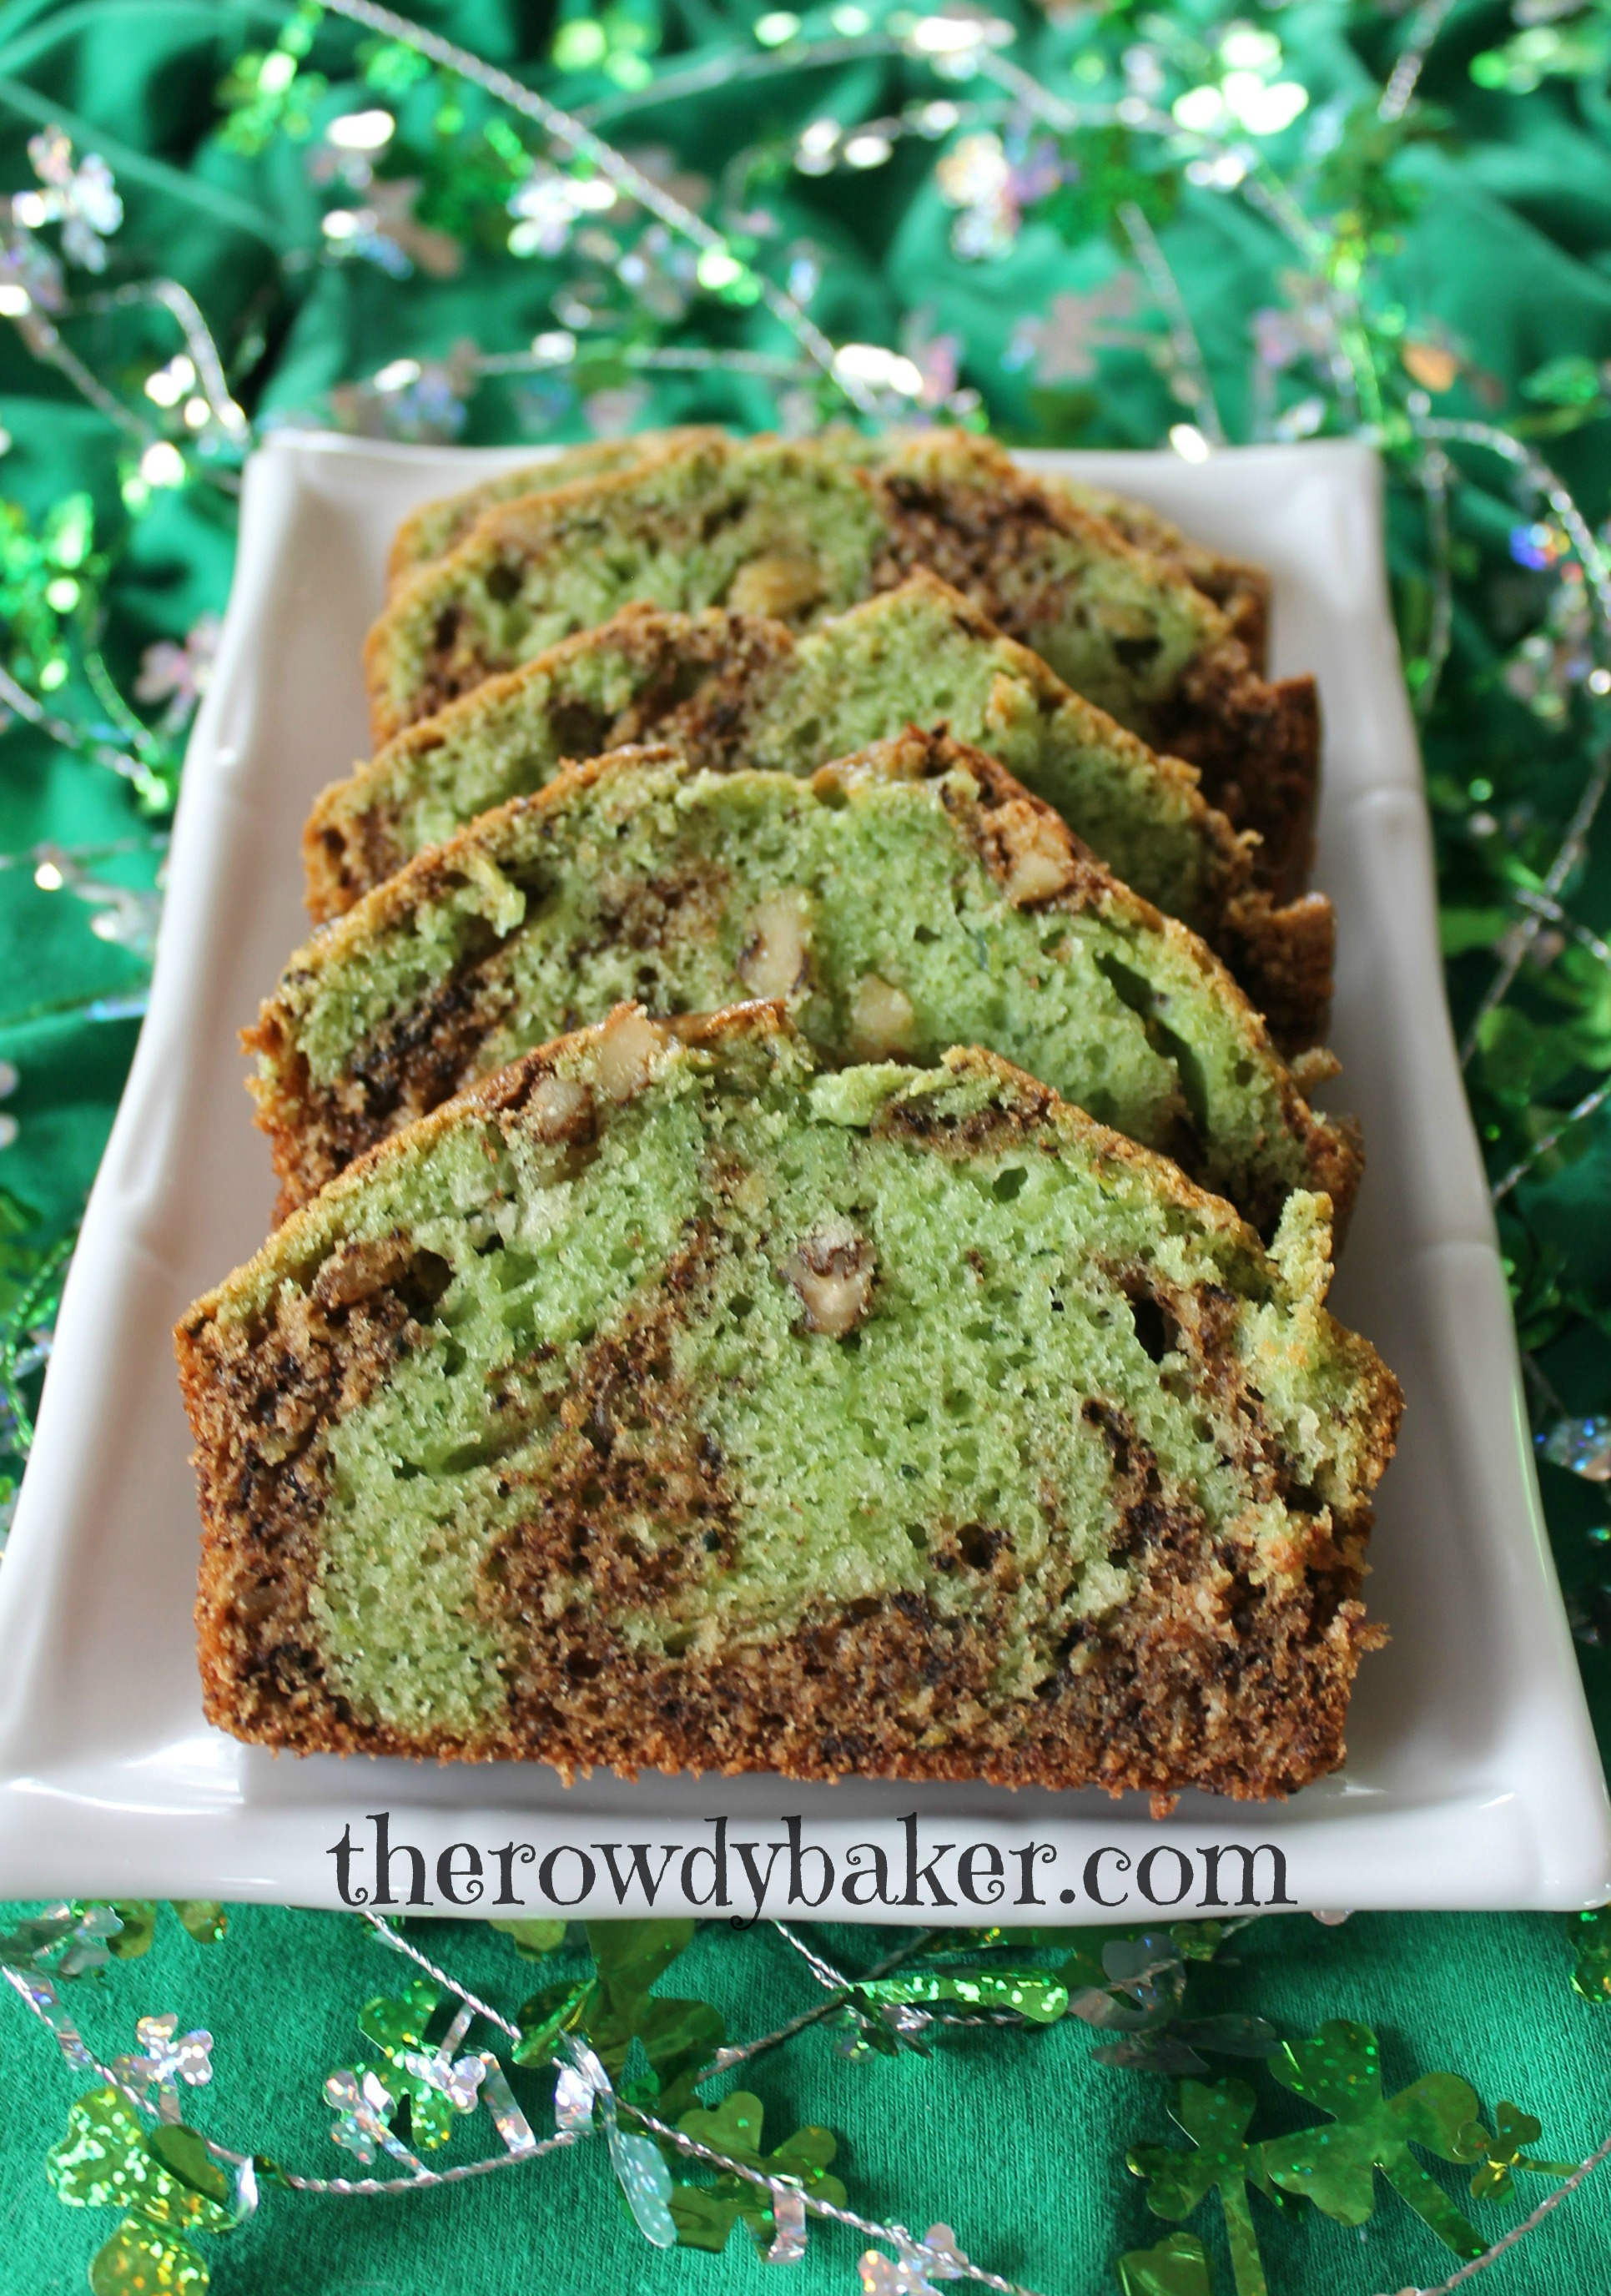 Chocolate Mint Swirl Zucchini Bread | The Rowdy Baker